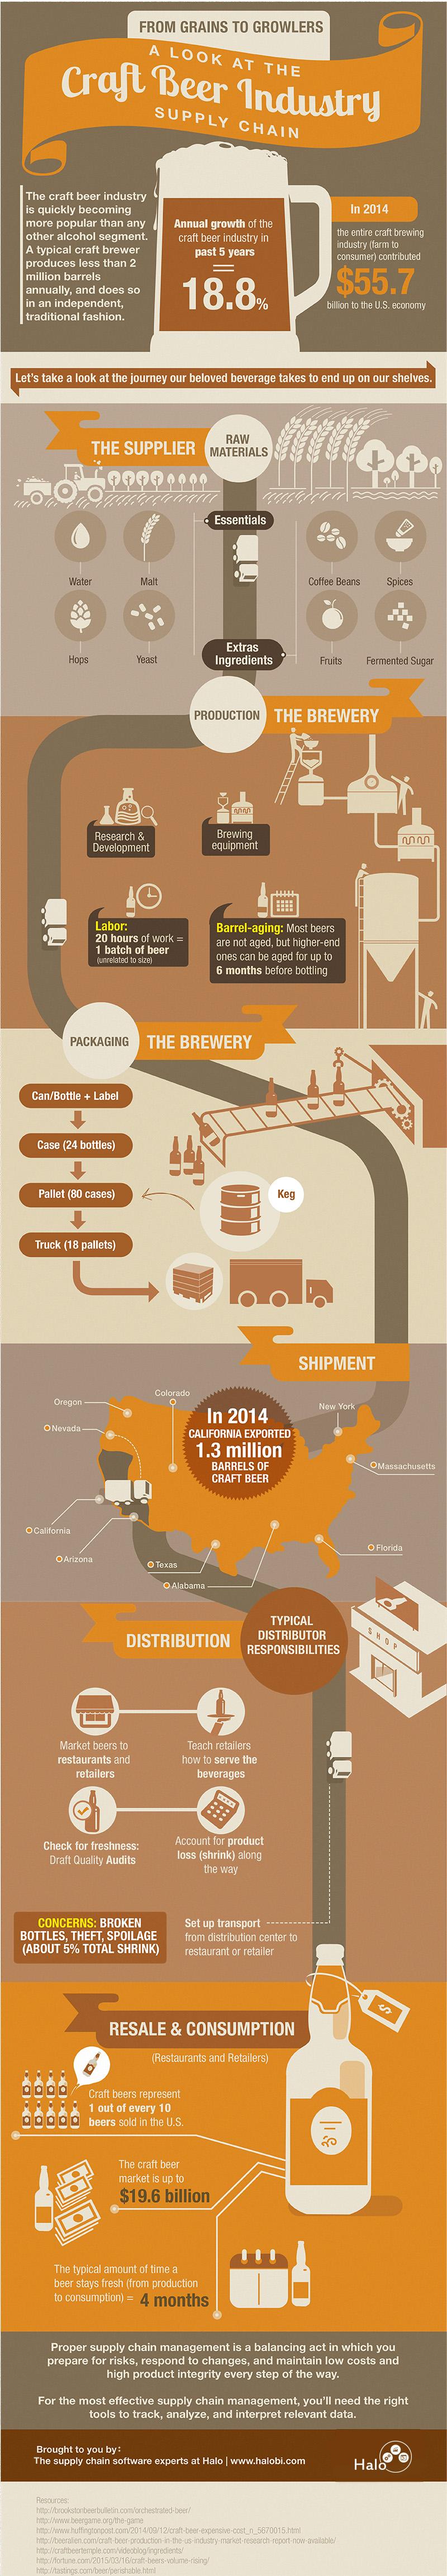 http://brandongaille.com/wp-content/uploads/2016/04/Craft-Beer-Industry-Statistics.jpg